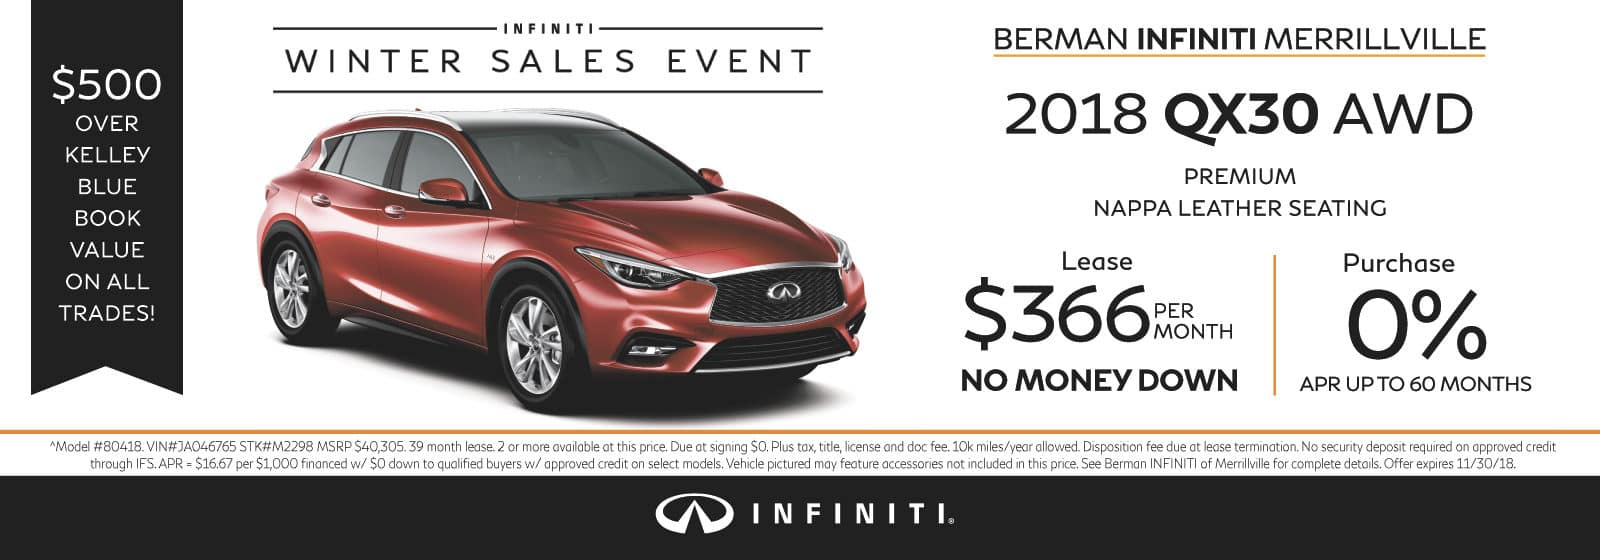 New 2018 INFINITI QX30 November Offer at Berman INFINITI of Merrillville!